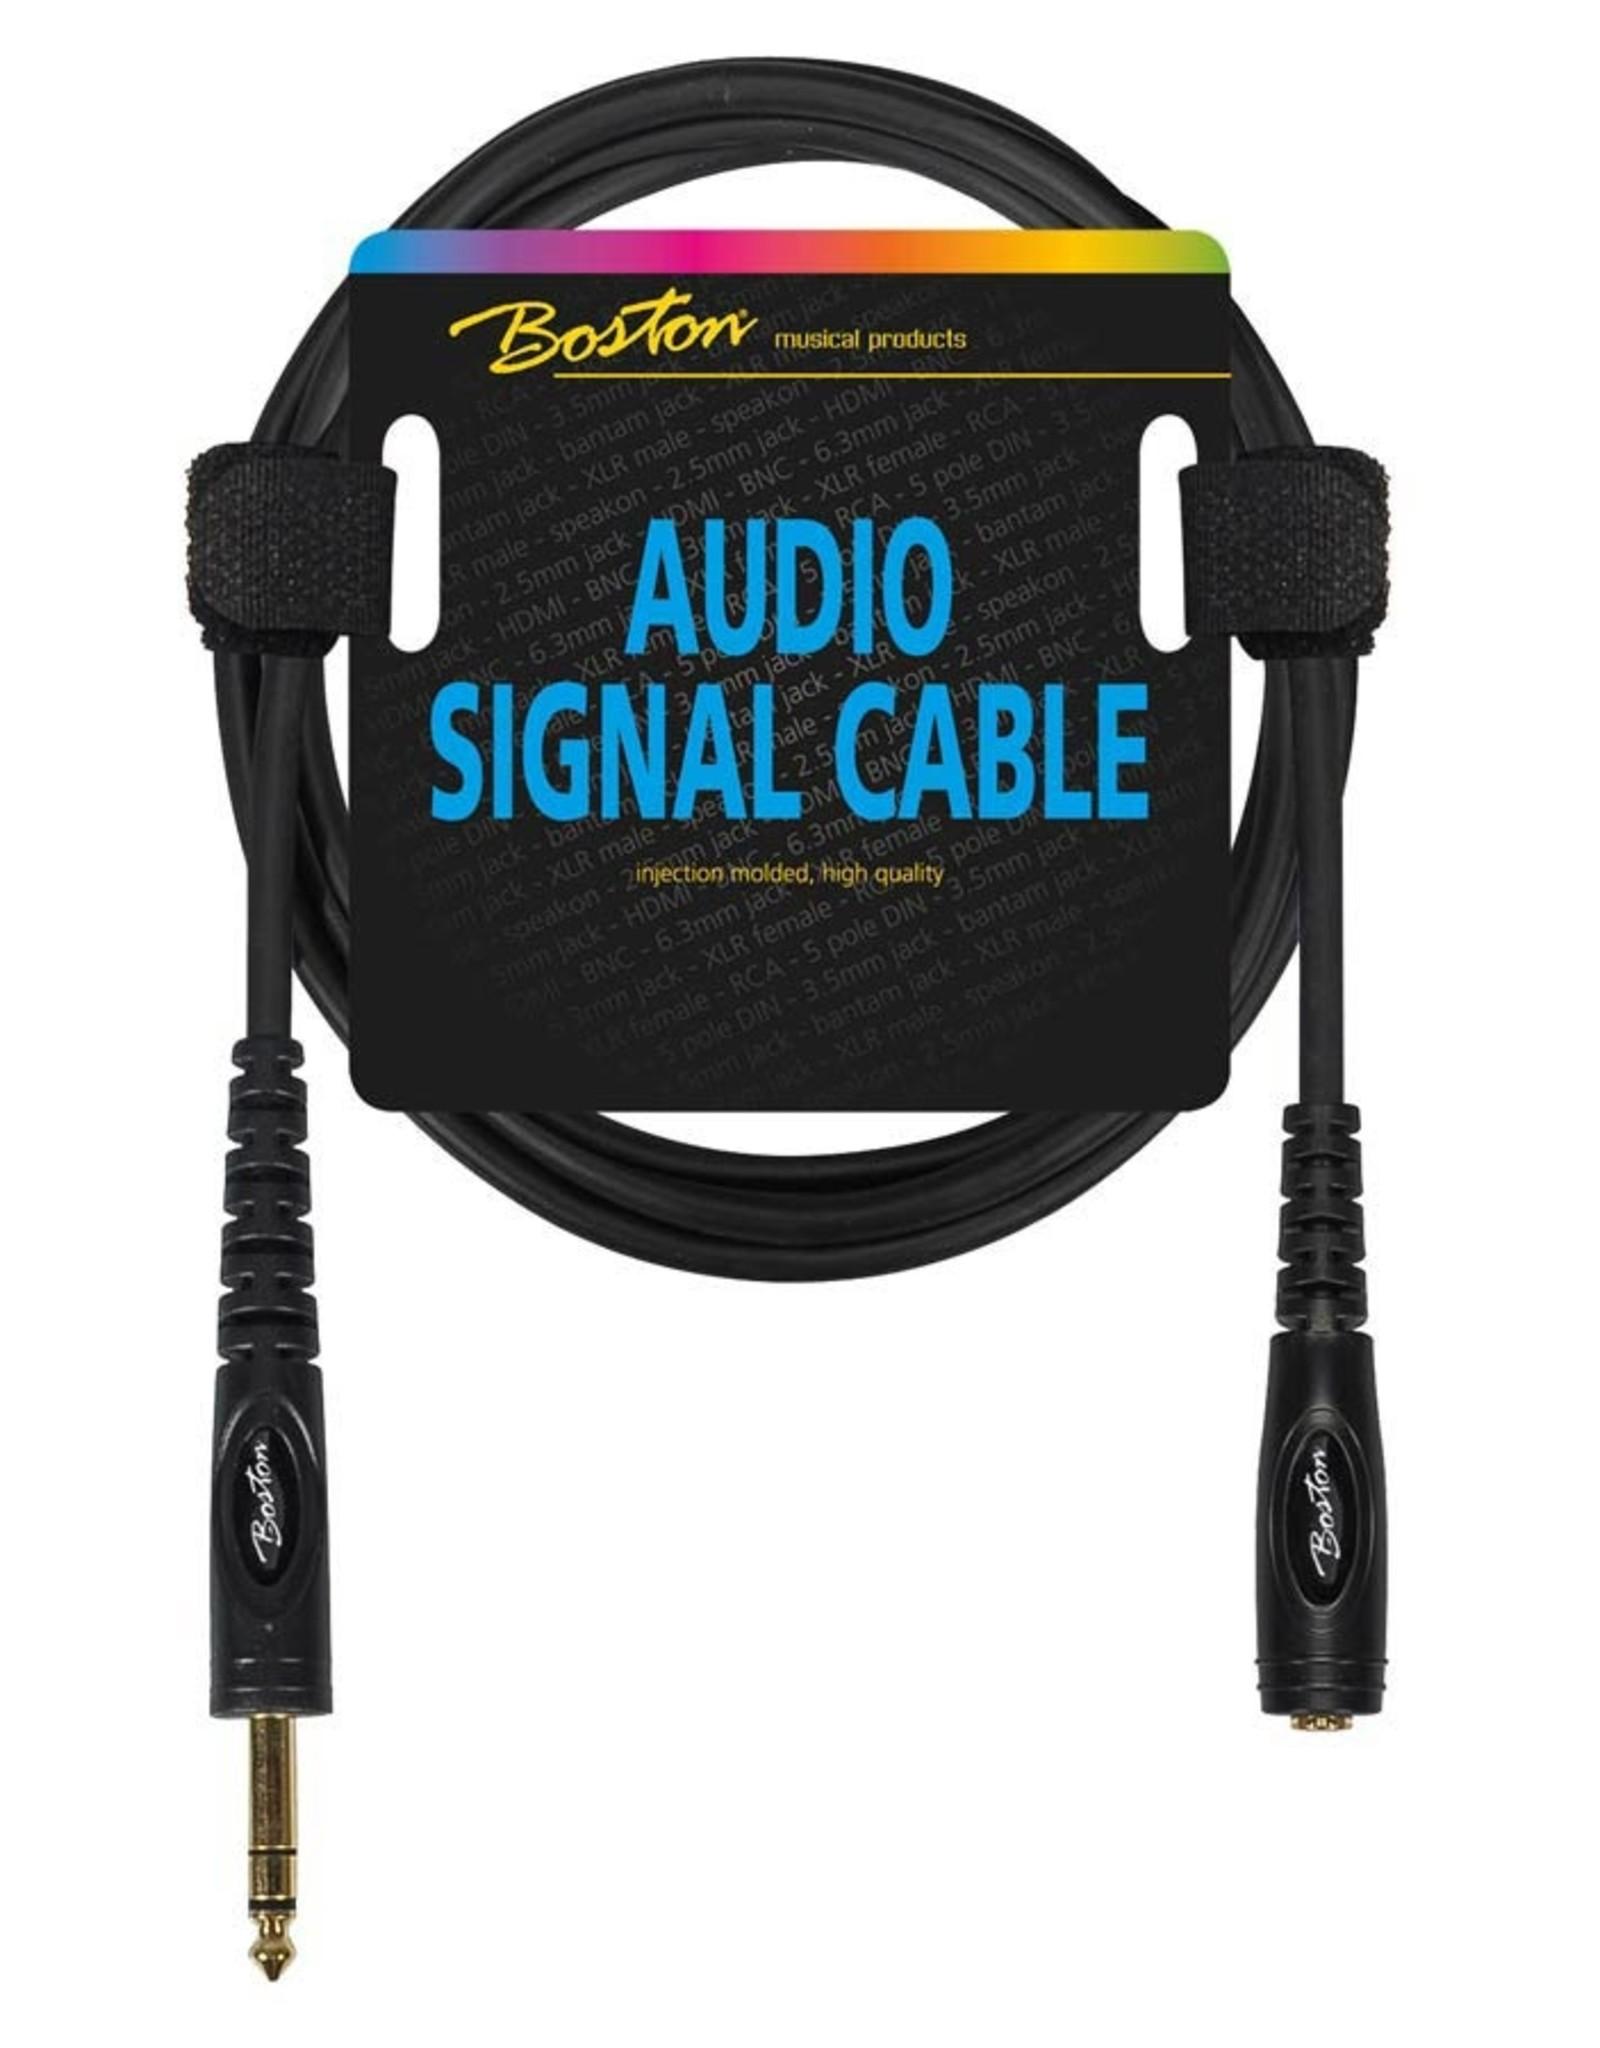 Boston  AC-242-300| Boston audio signaalkabel